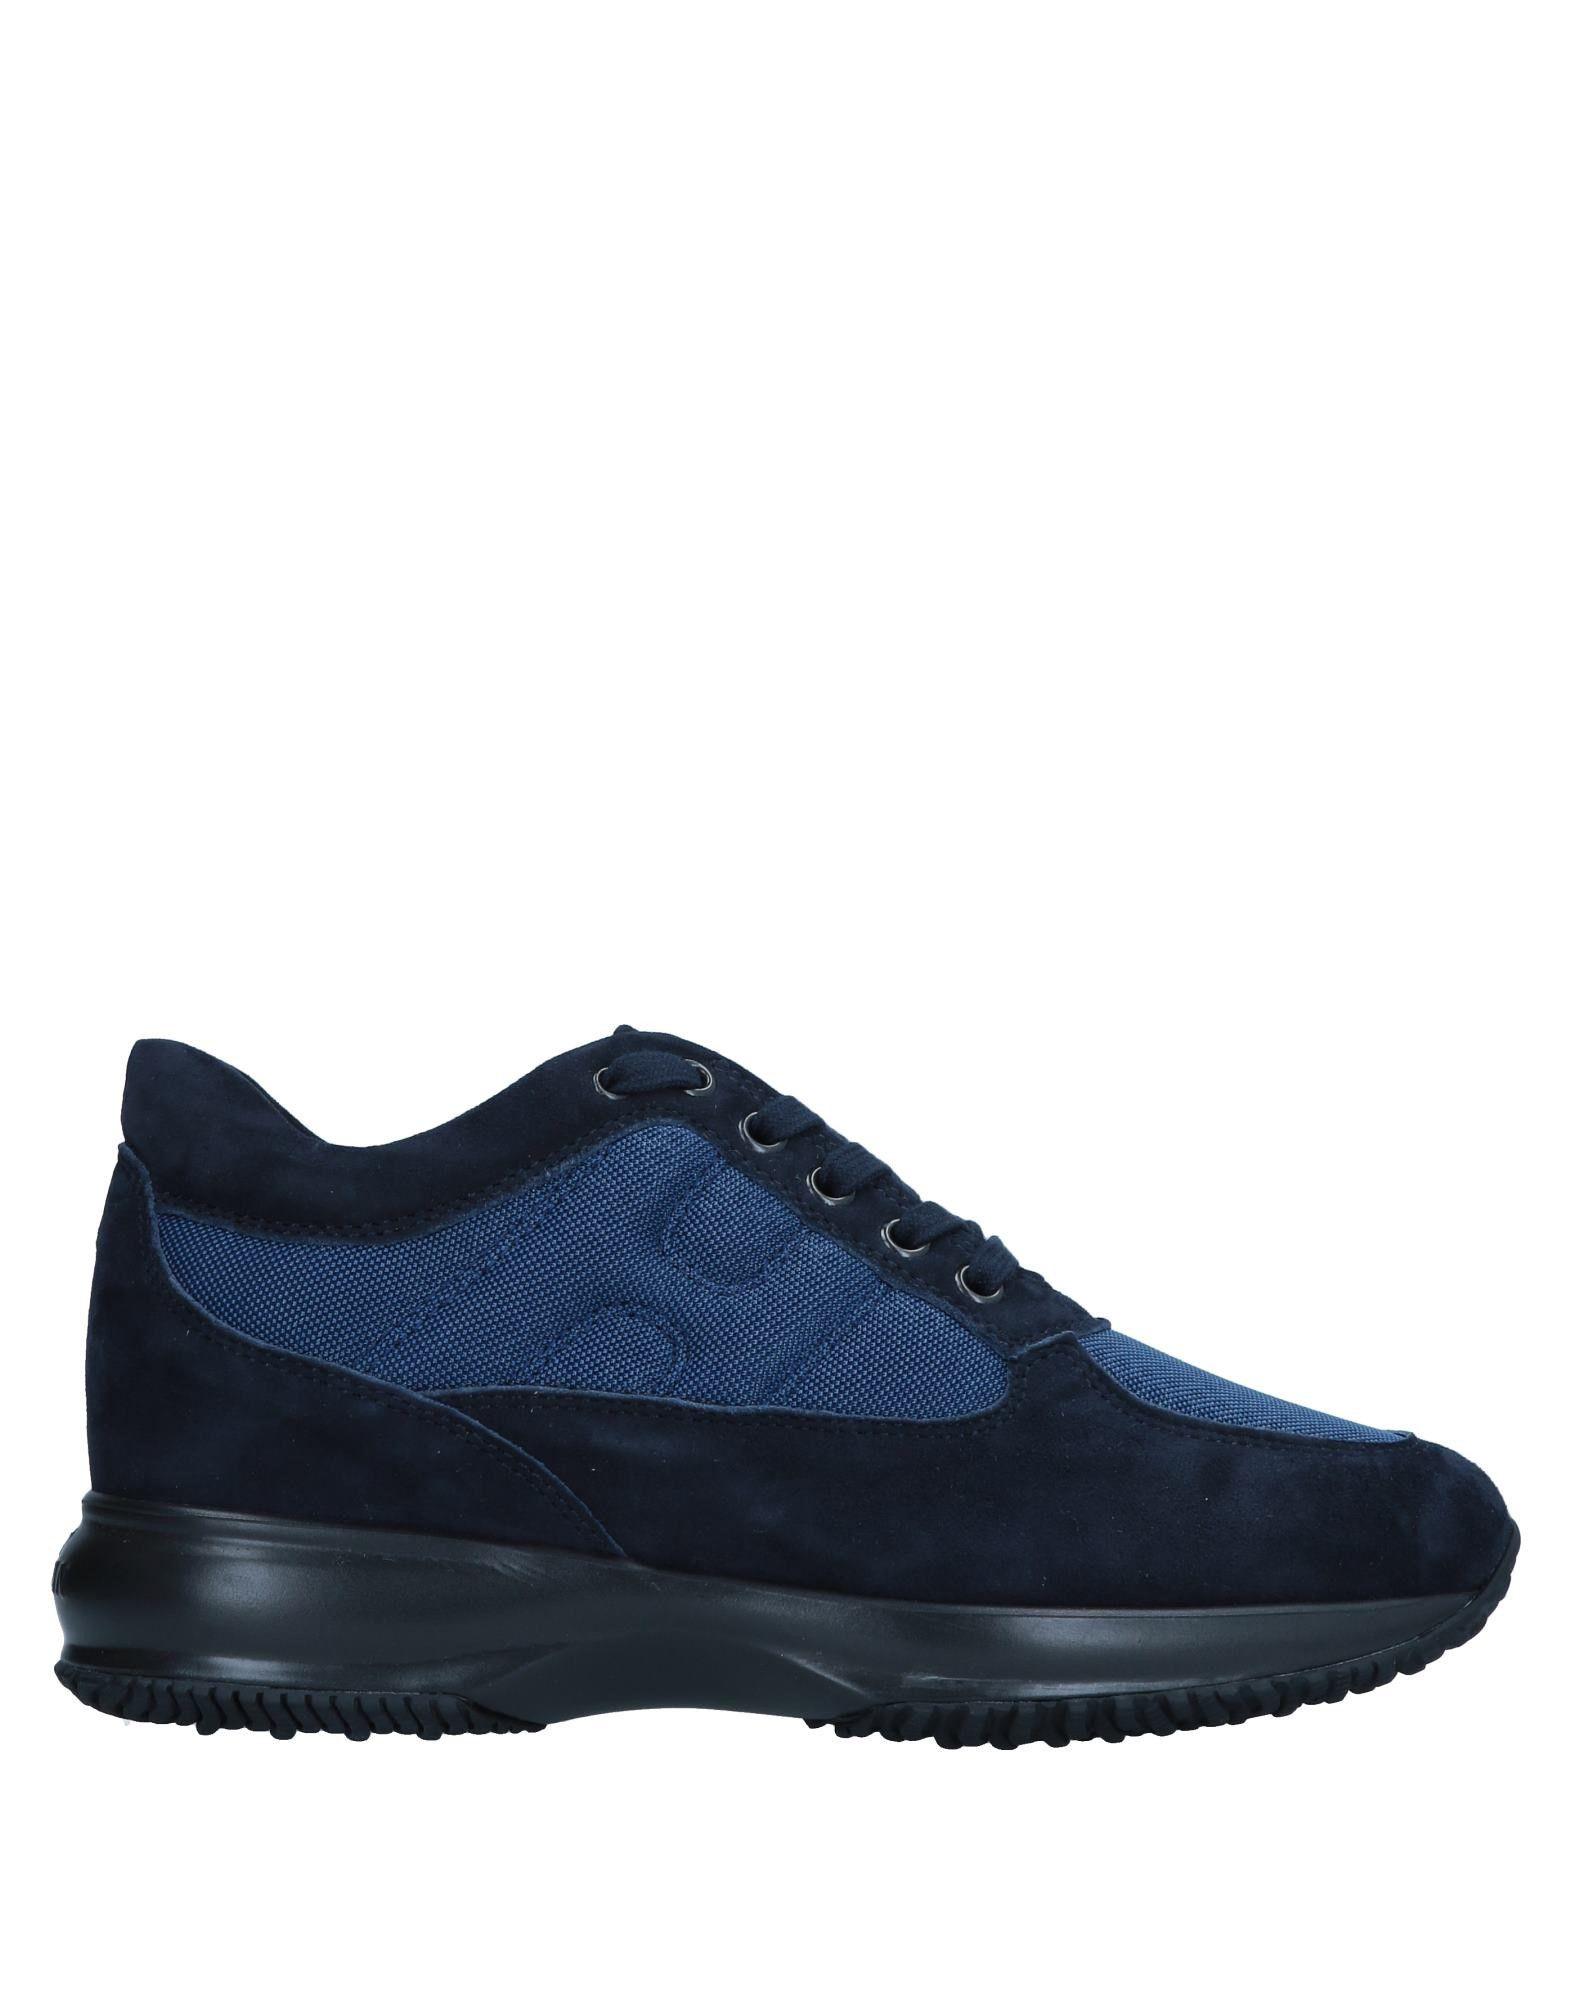 Moda Sneakers Sneakers Moda Hogan Donna - 11543529EO c0d14d